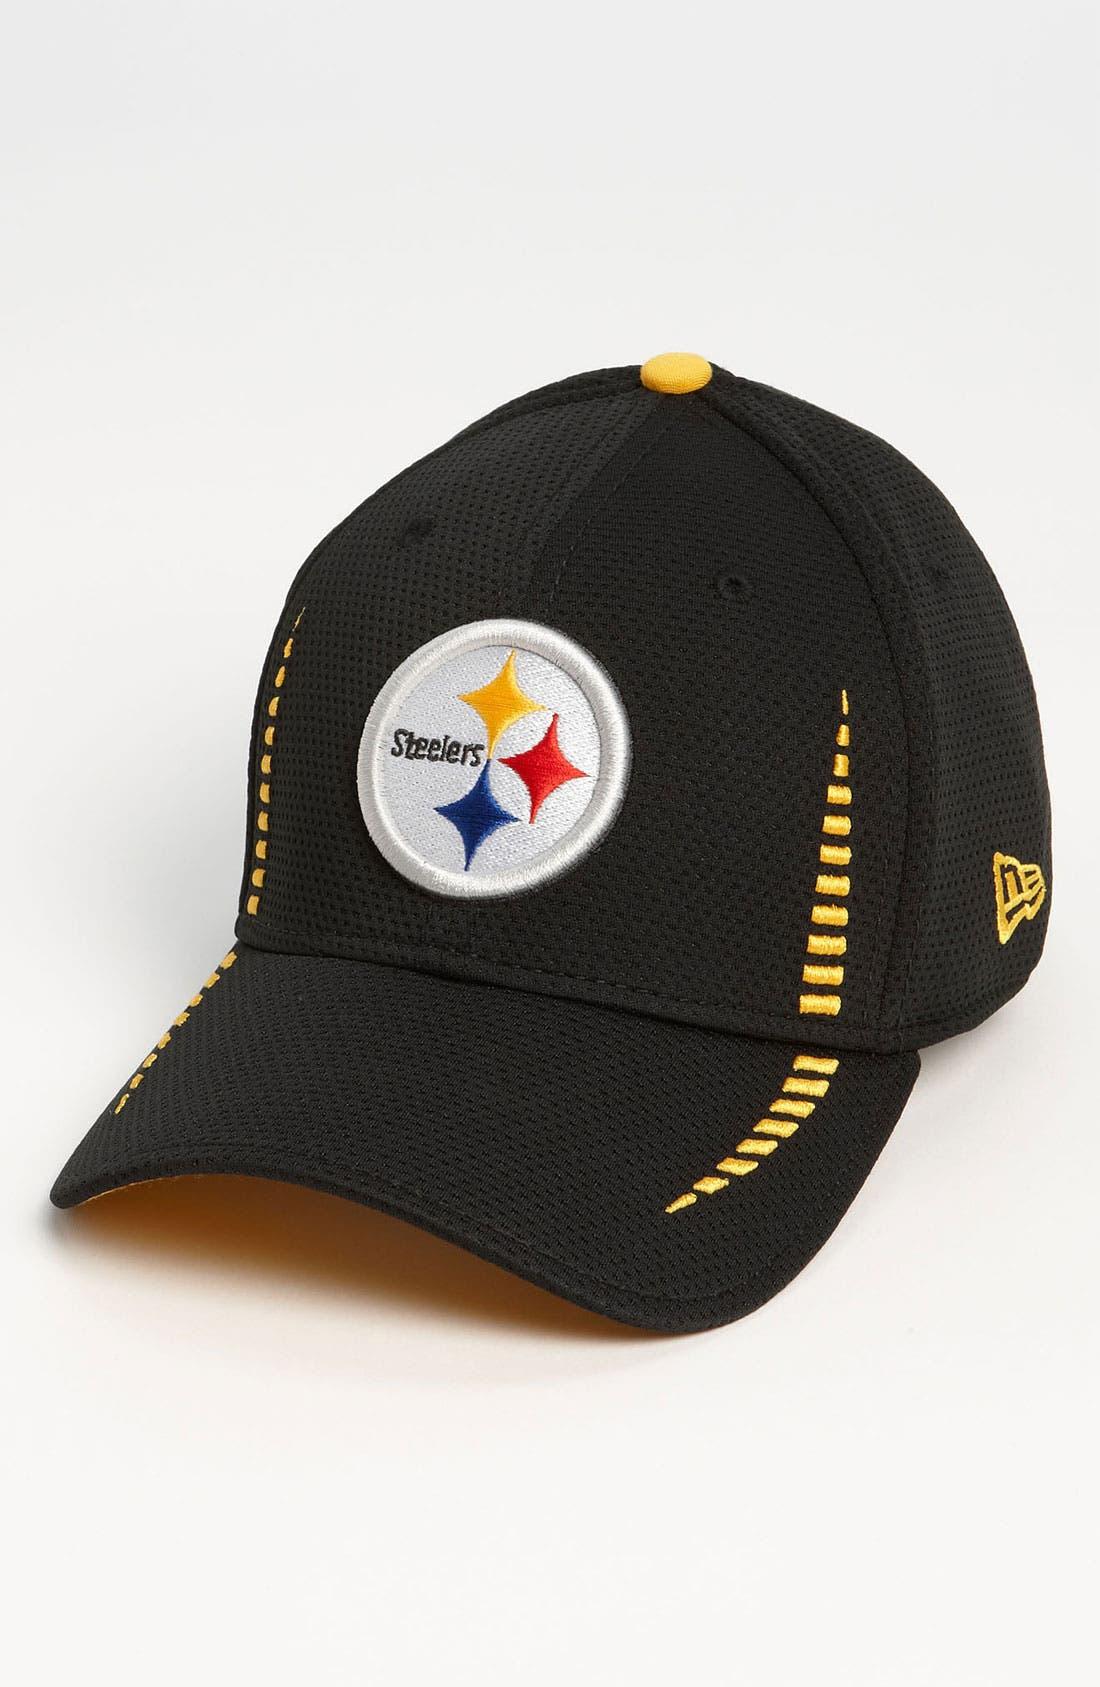 'Training Camp - Pittsburgh Steelers' Baseball Cap,                             Main thumbnail 1, color,                             001